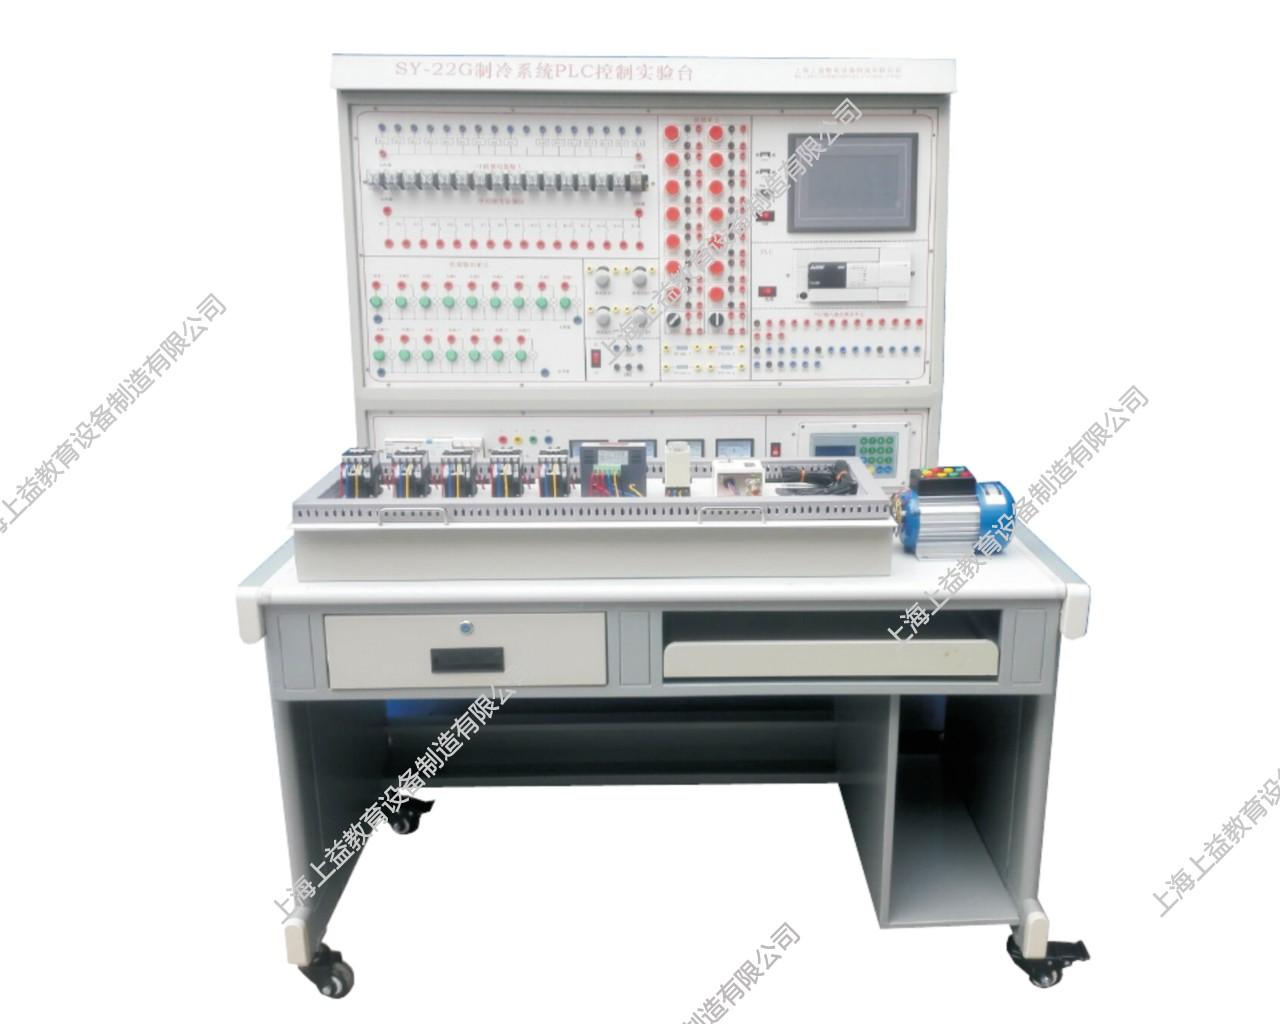 SY-22G制冷系统PLC控制实验台